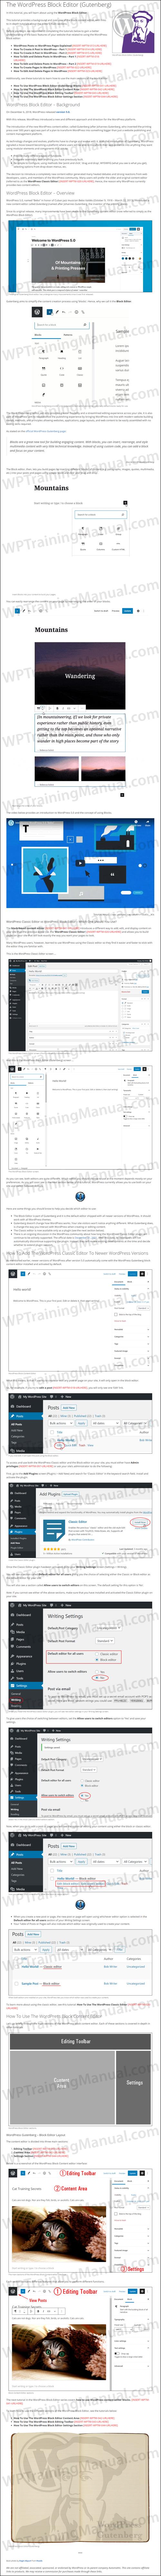 White Label Tutorial: The WordPress Block Editor (Gutenberg) - WPTrainingManual.com